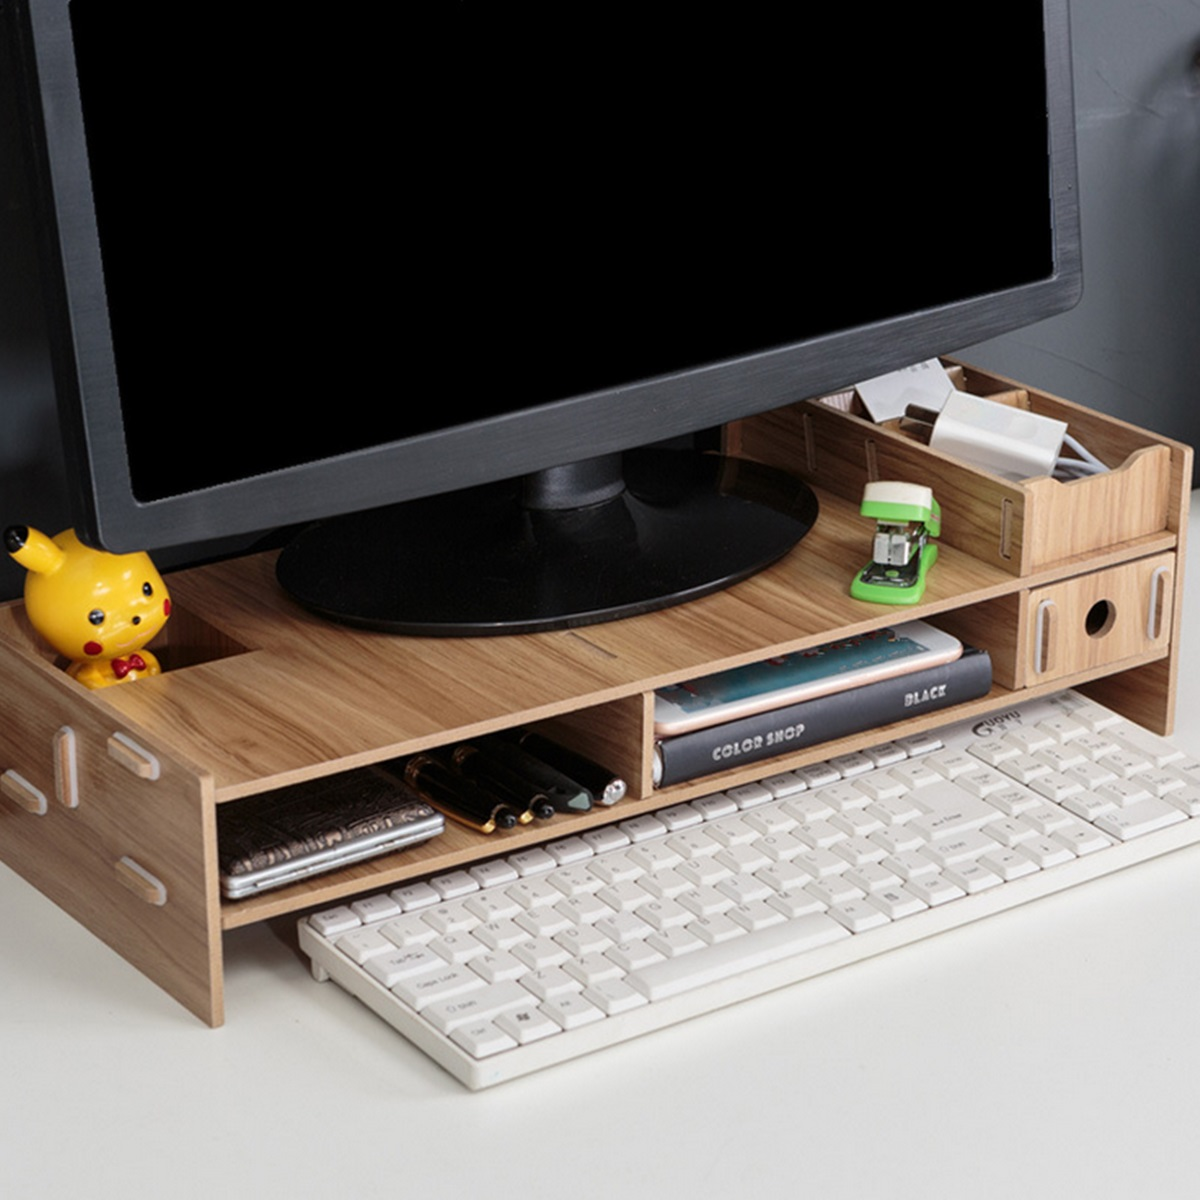 Desk-Holder Shelf Laptop-Stand Wood Desktop Monitor Stand Computer Screen Riser Shelf Plinth Strong Laptop Stand Desk Holder